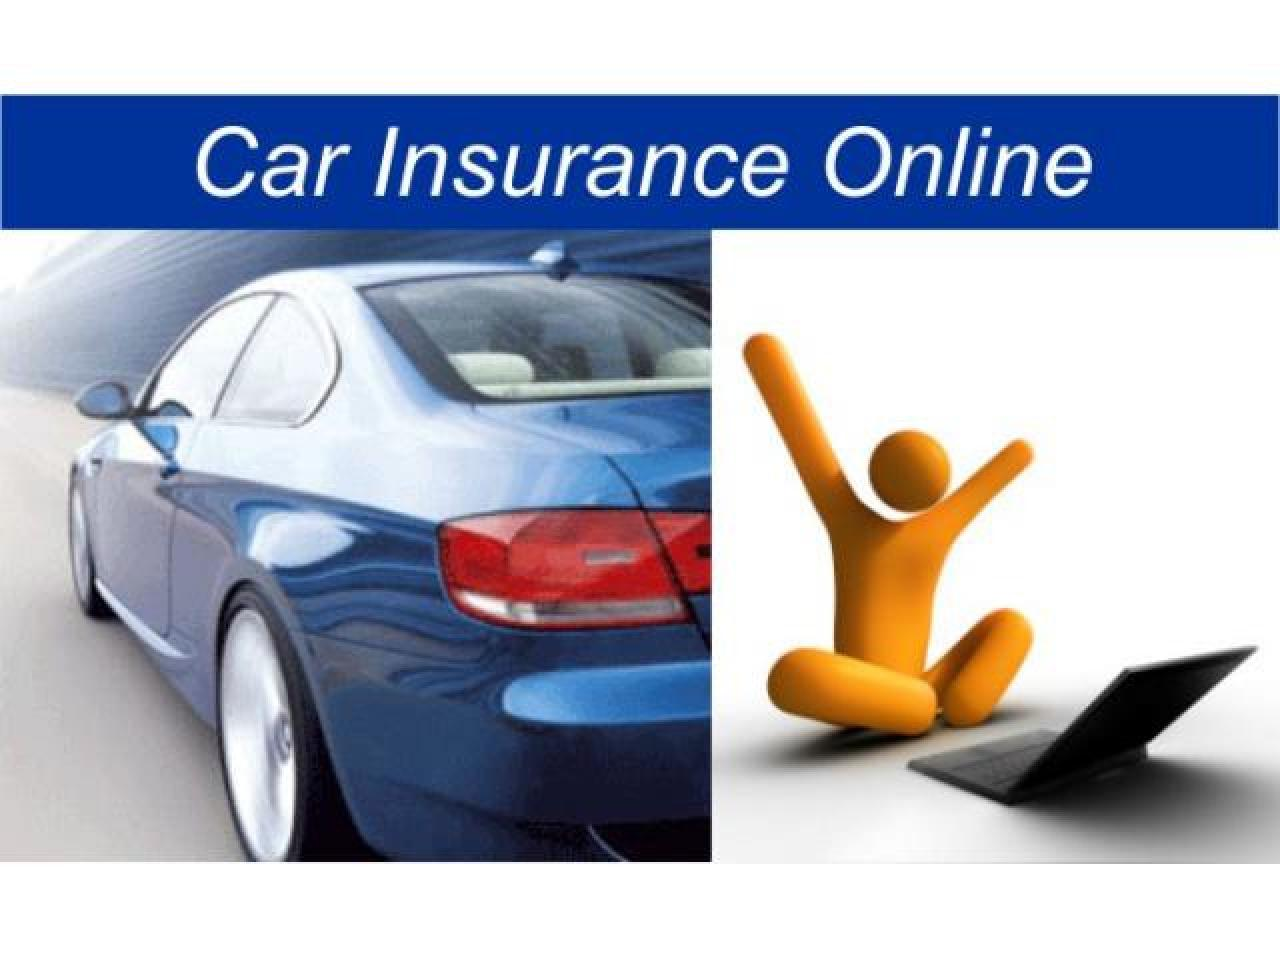 Car insurance (автор страхование) - 1